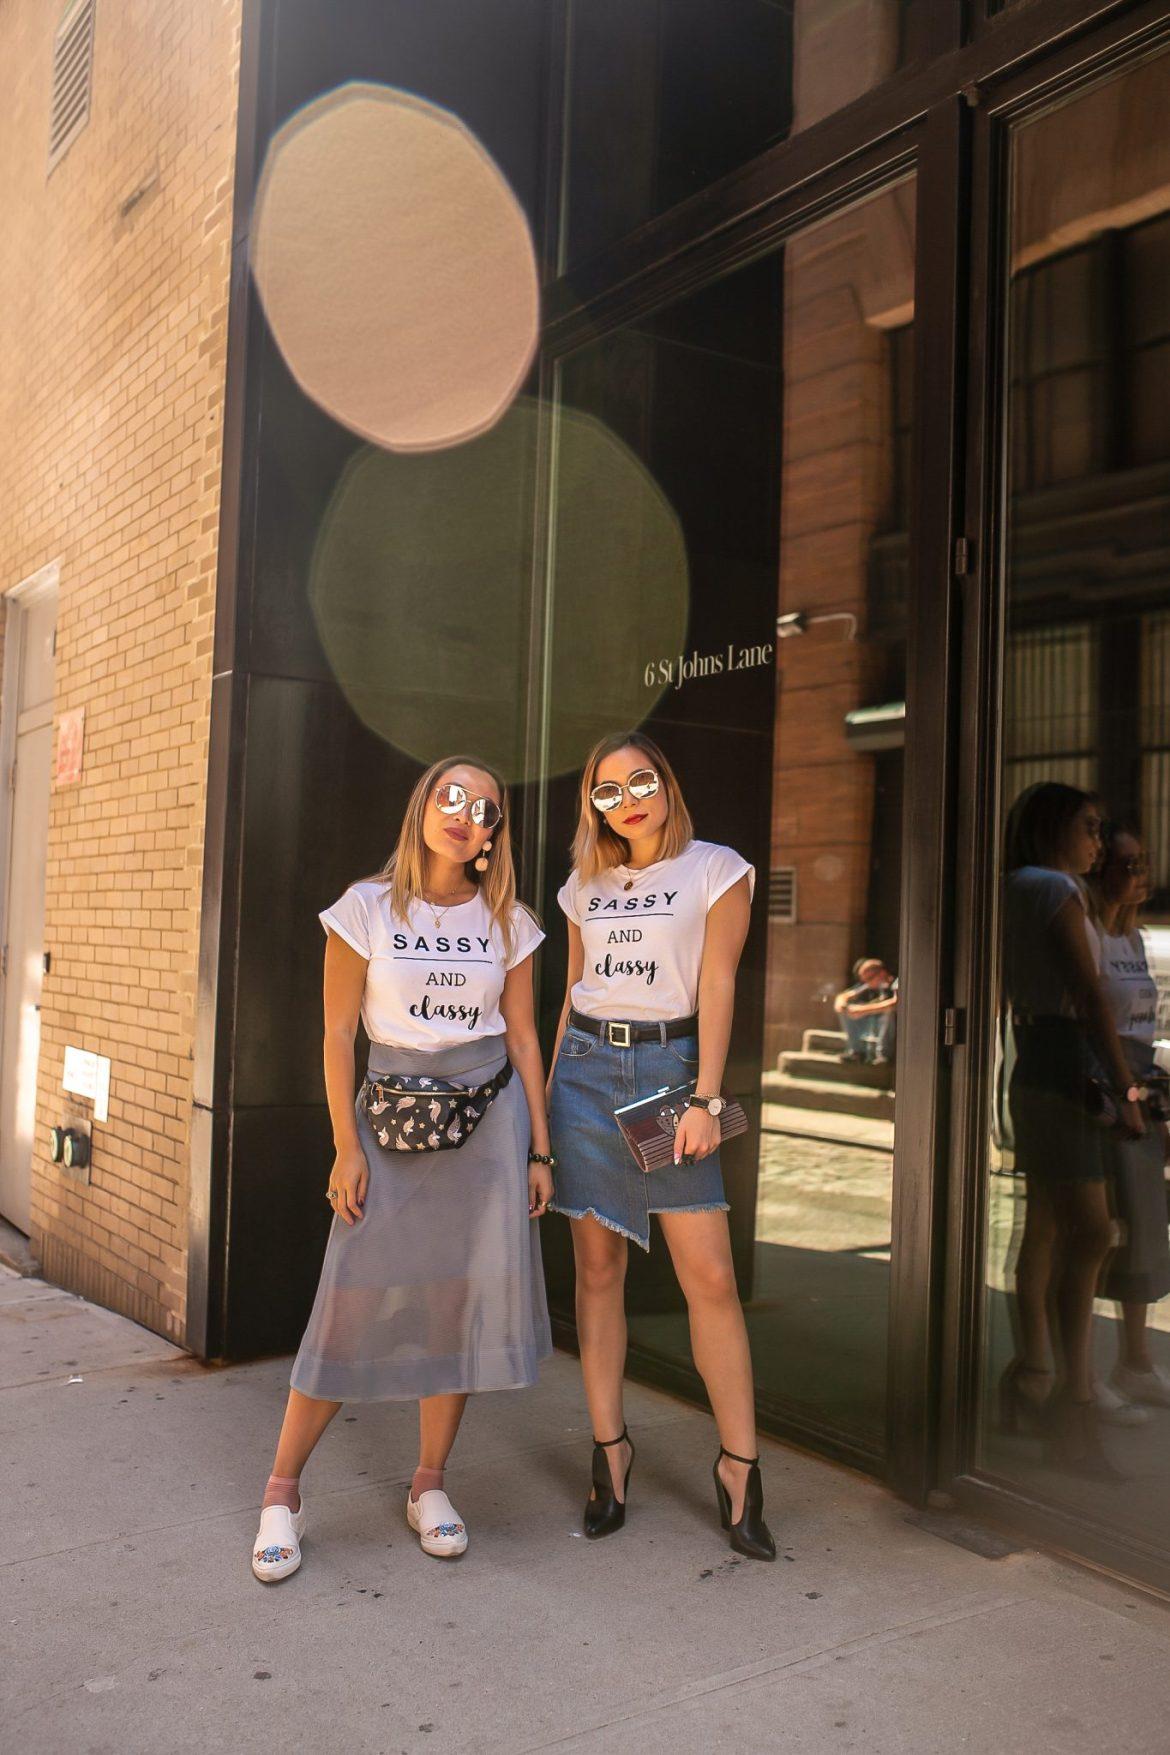 nyfw 2018 New York Fashion Week Carol Viliotti TheStyleWright ISTI Clutch Sugarhigh Denim Skirt White Tee Color bLock Heel Sequin Jewelry Daniel Wellington Yay Sunshine Fashion Blogger Sassy and Classy Logo Tee